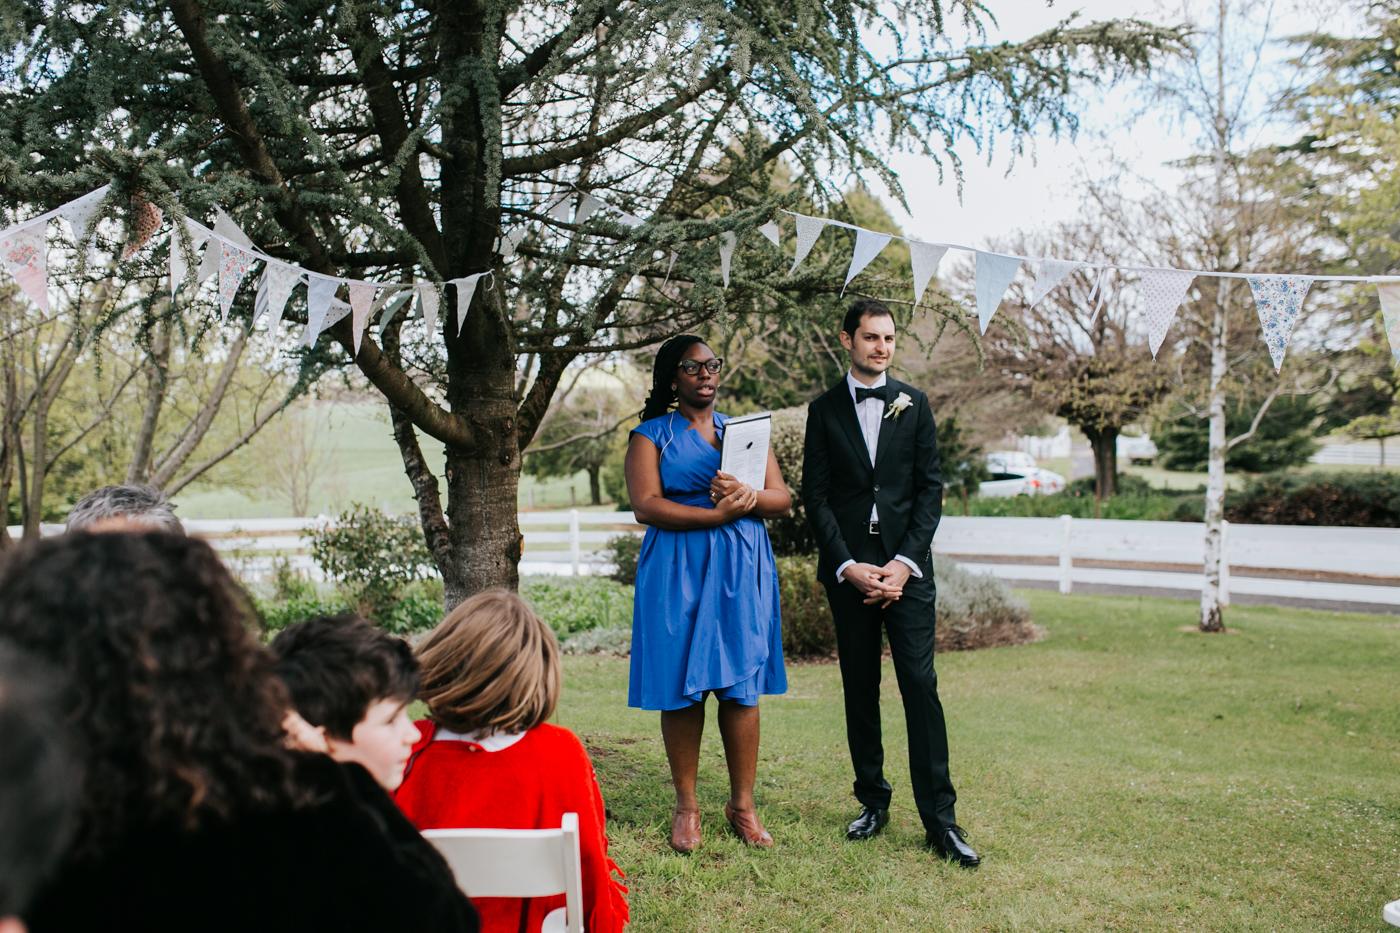 Bridget & James - Orange Country Wedding - Samantha Heather Photography-19.jpg